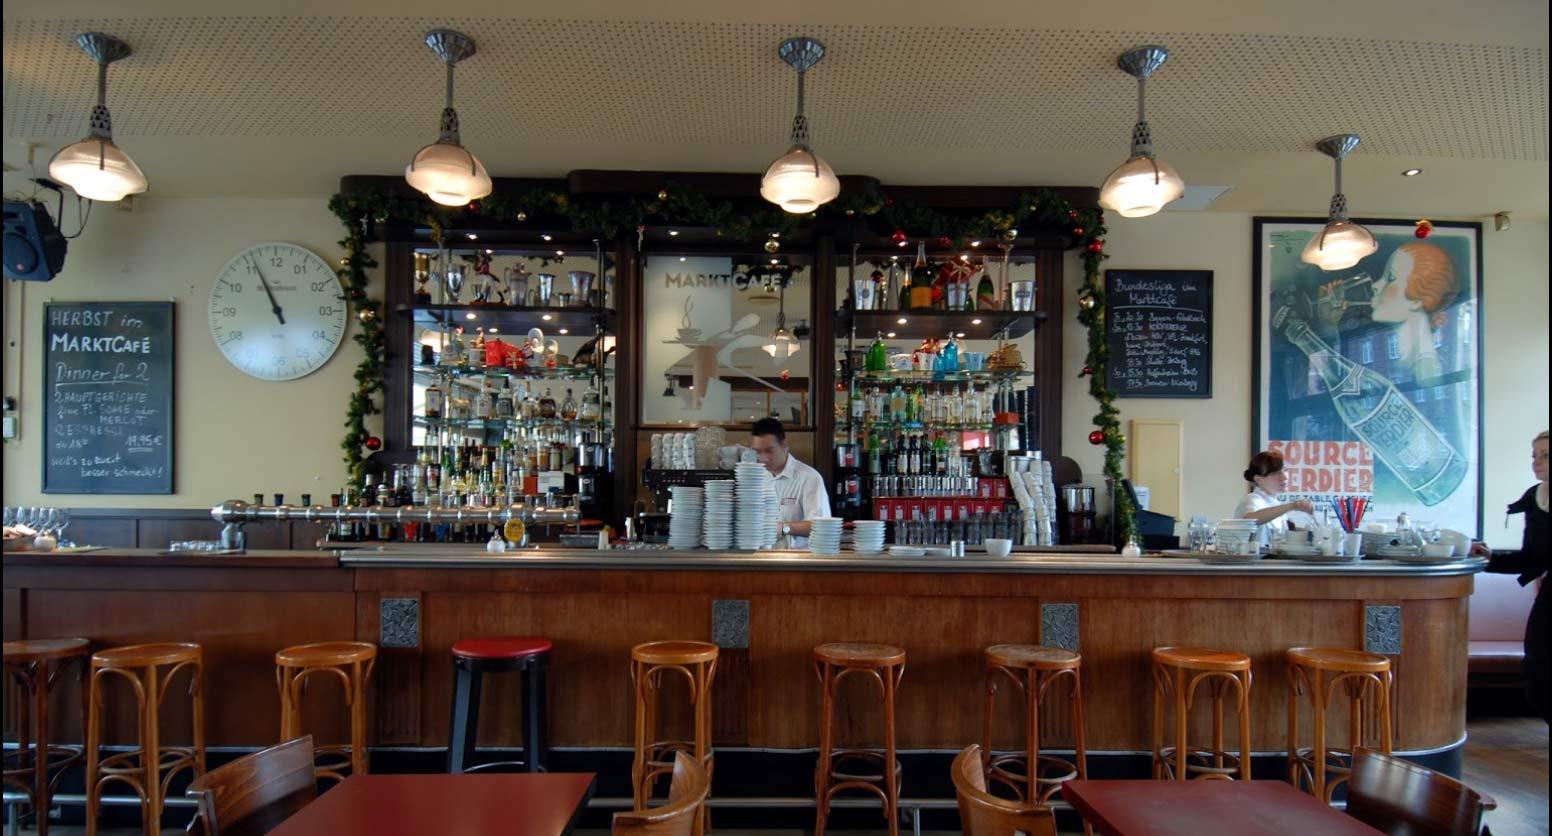 Die Pariser Theke im Marktcafe - dem Cafe in Münster